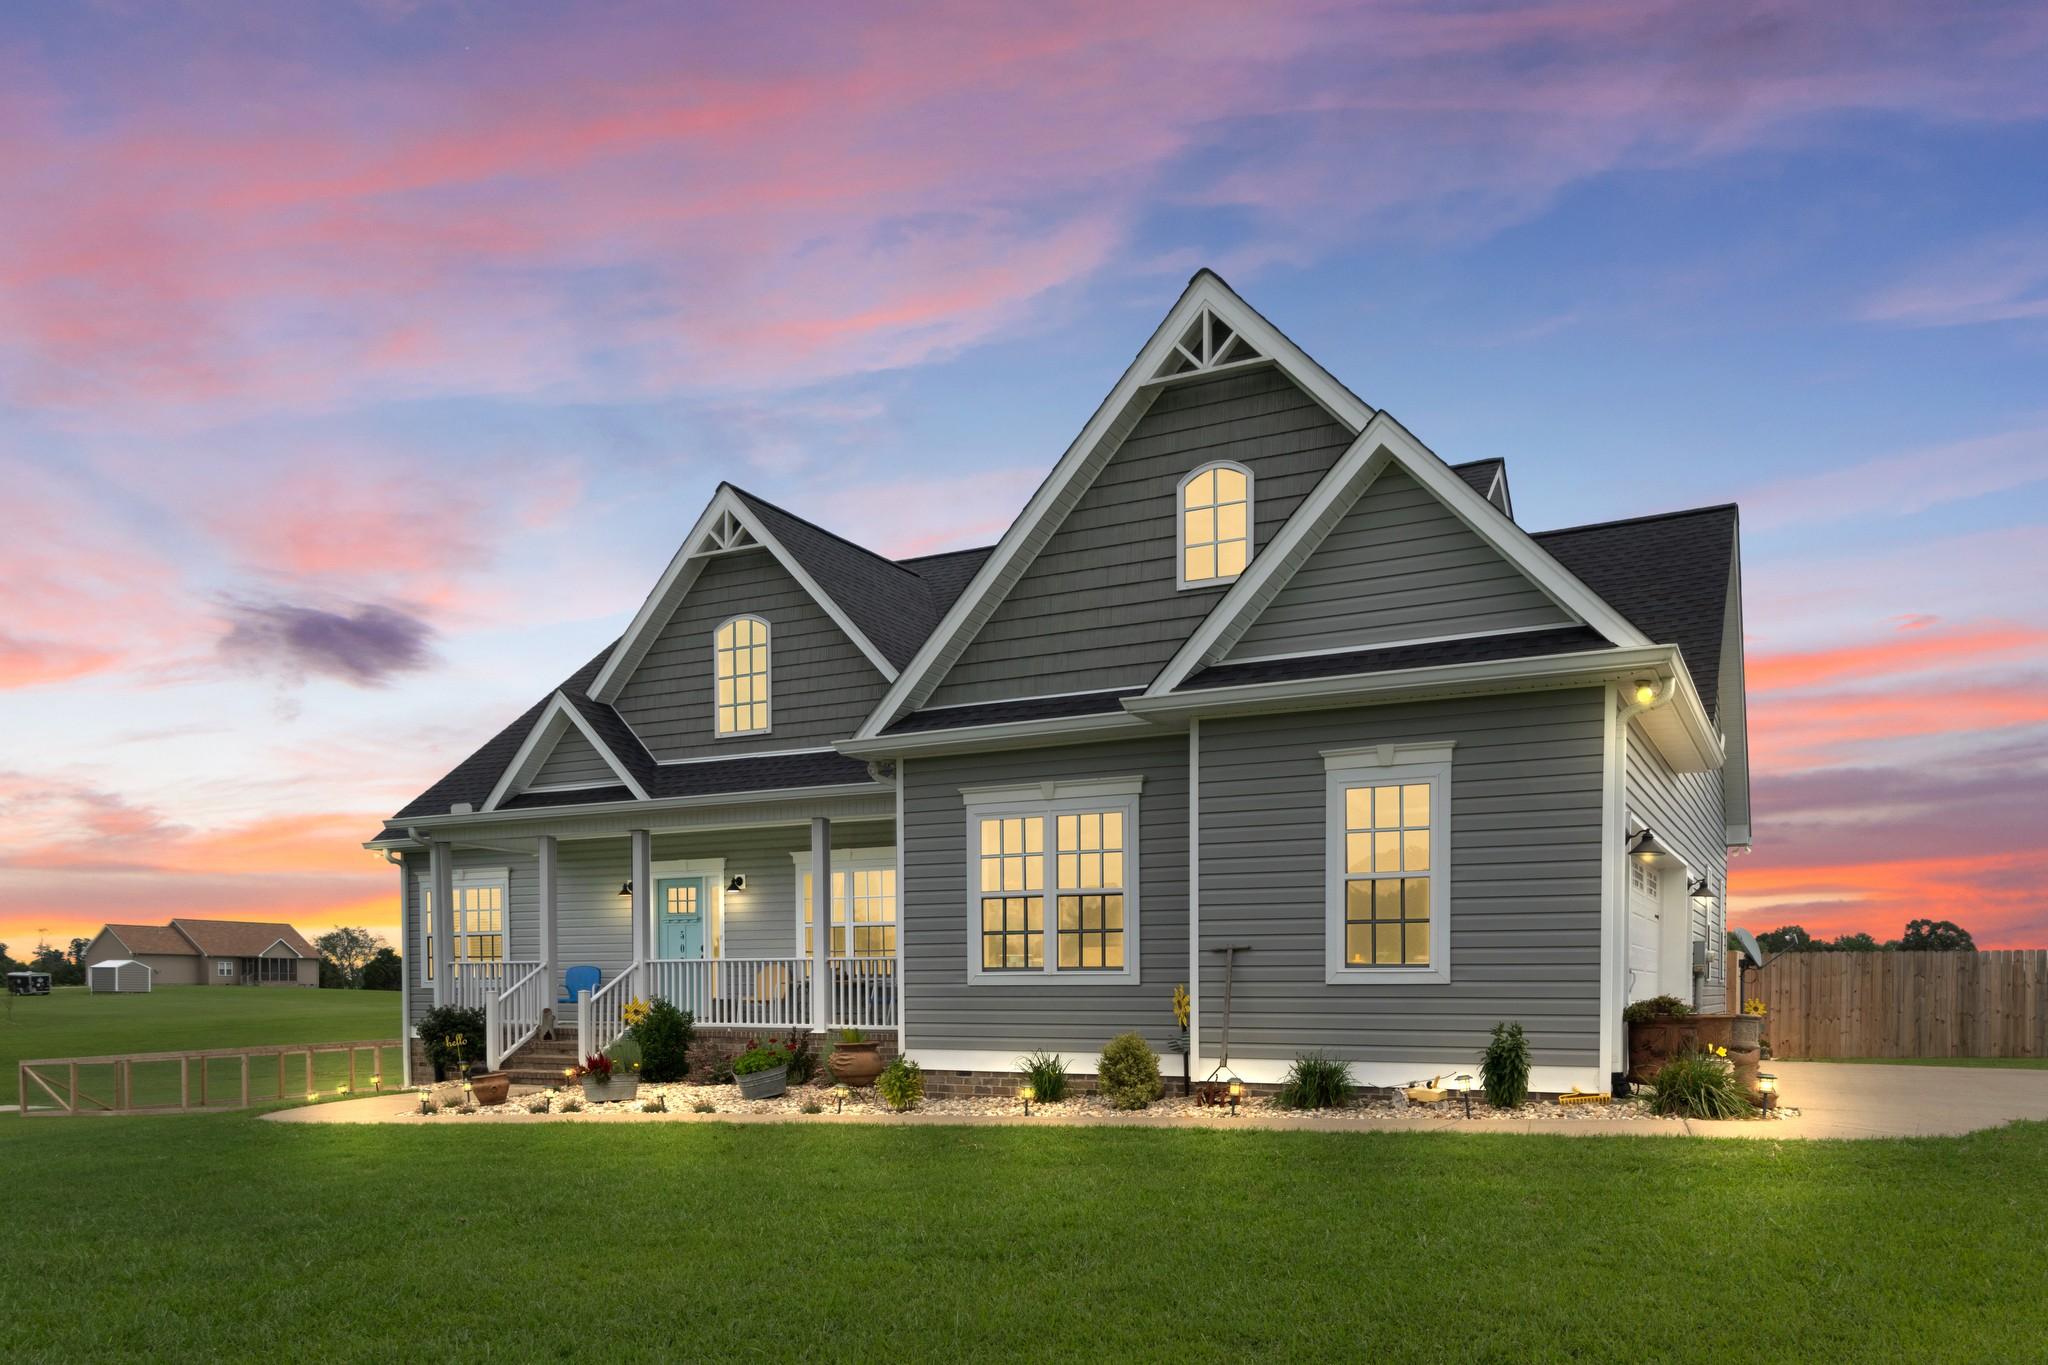 507 N Davidson Rd Property Photo - Bon Aqua, TN real estate listing